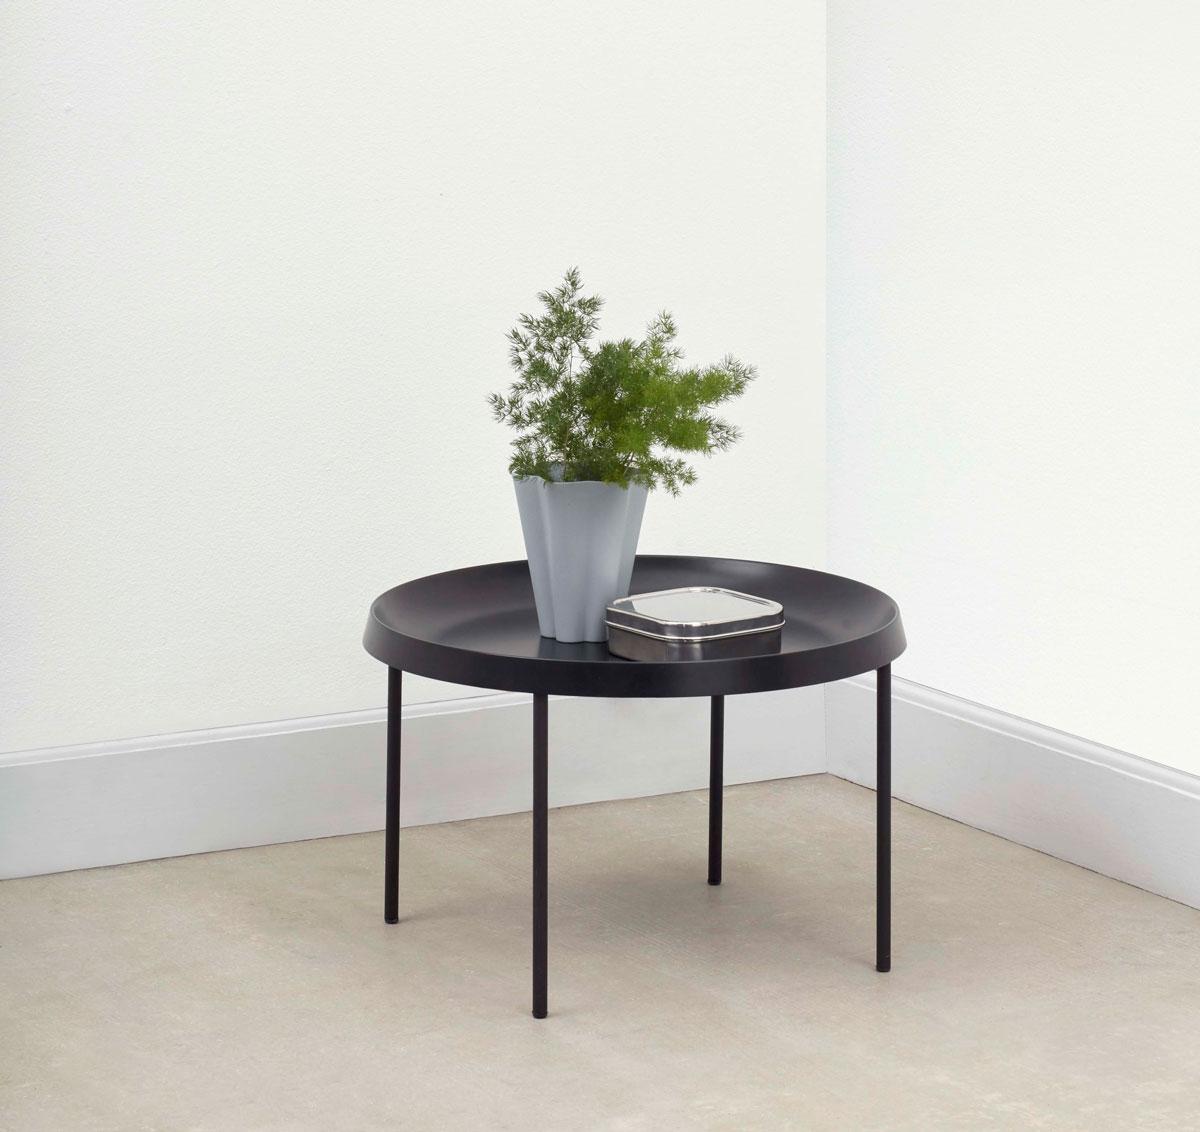 HAY Tulou Brickbord i svart färg av GamFratesi